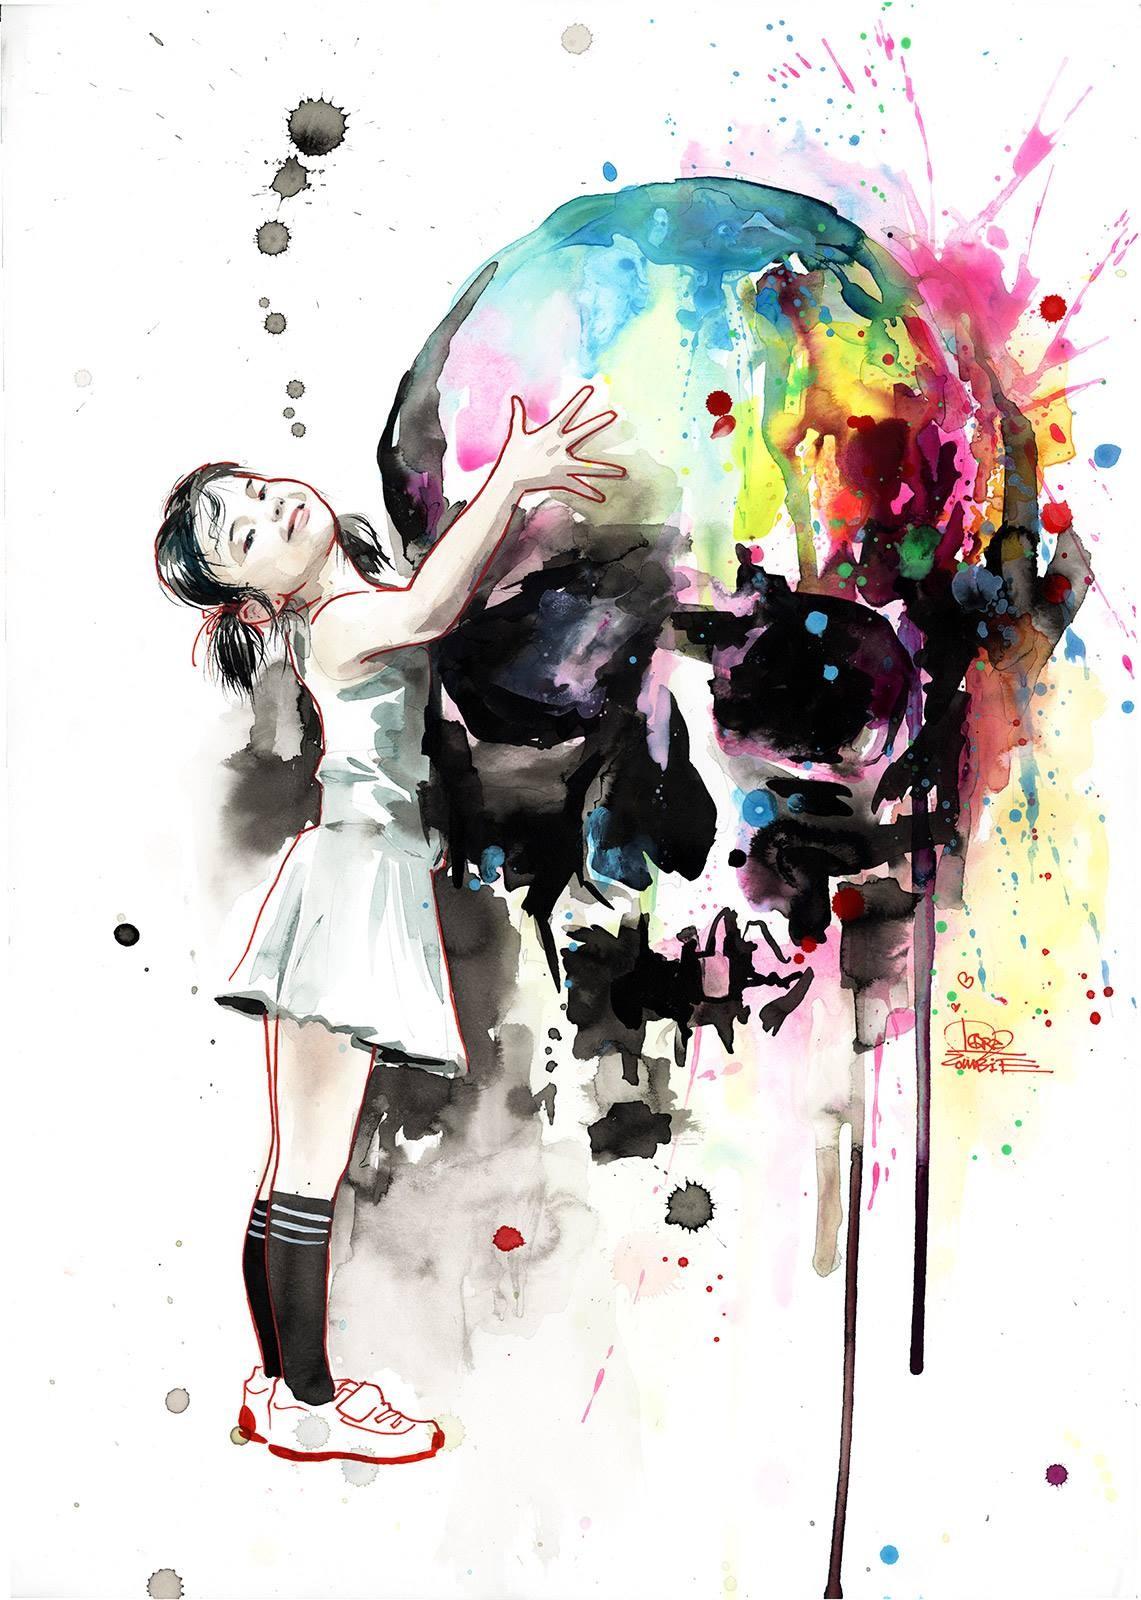 Fond d 39 cran color la peinture illustration anime - Dessin colore ...